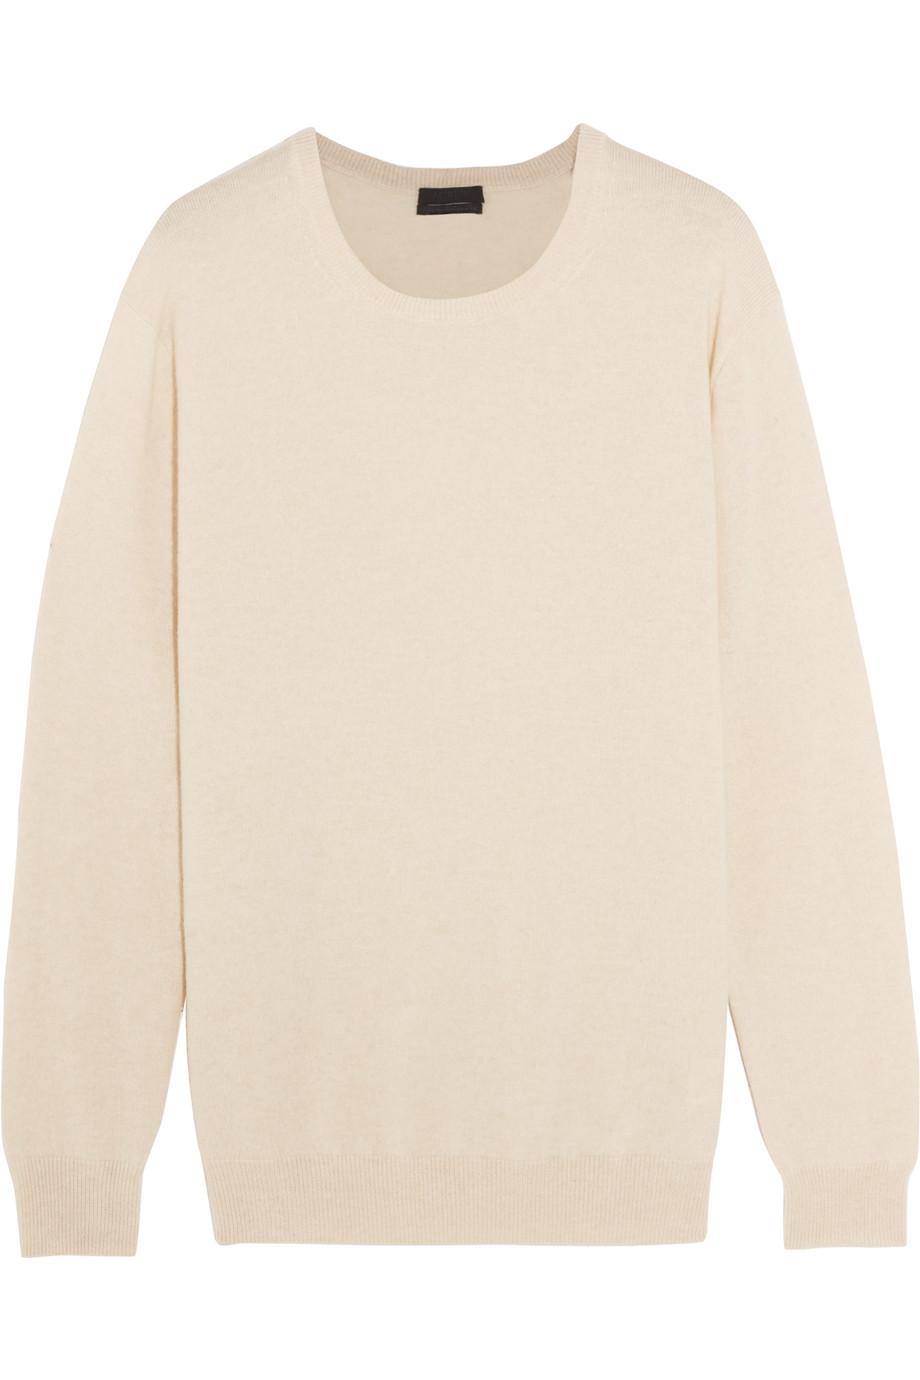 J.Crew Collection Cashmere Sweater, Beige, Women's